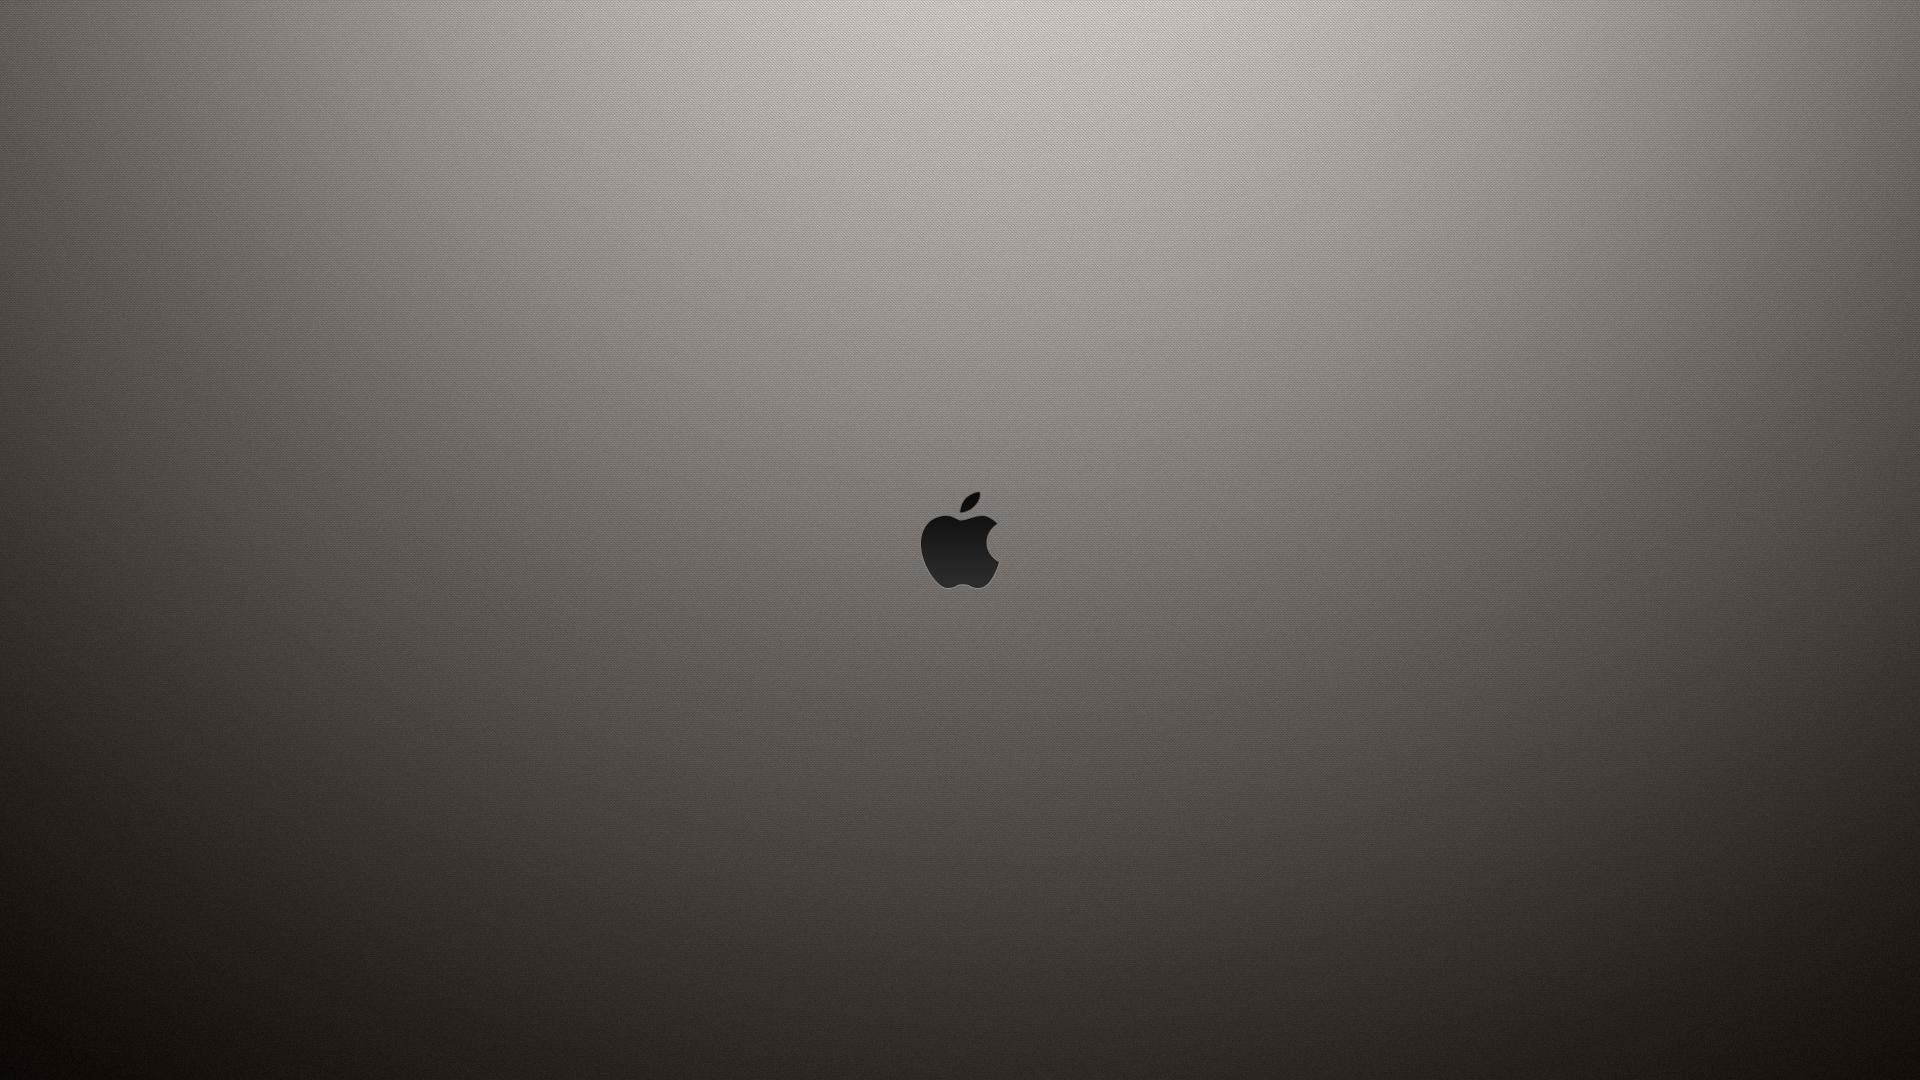 Pin By Evan Miller On Apple Logo Wallpaper